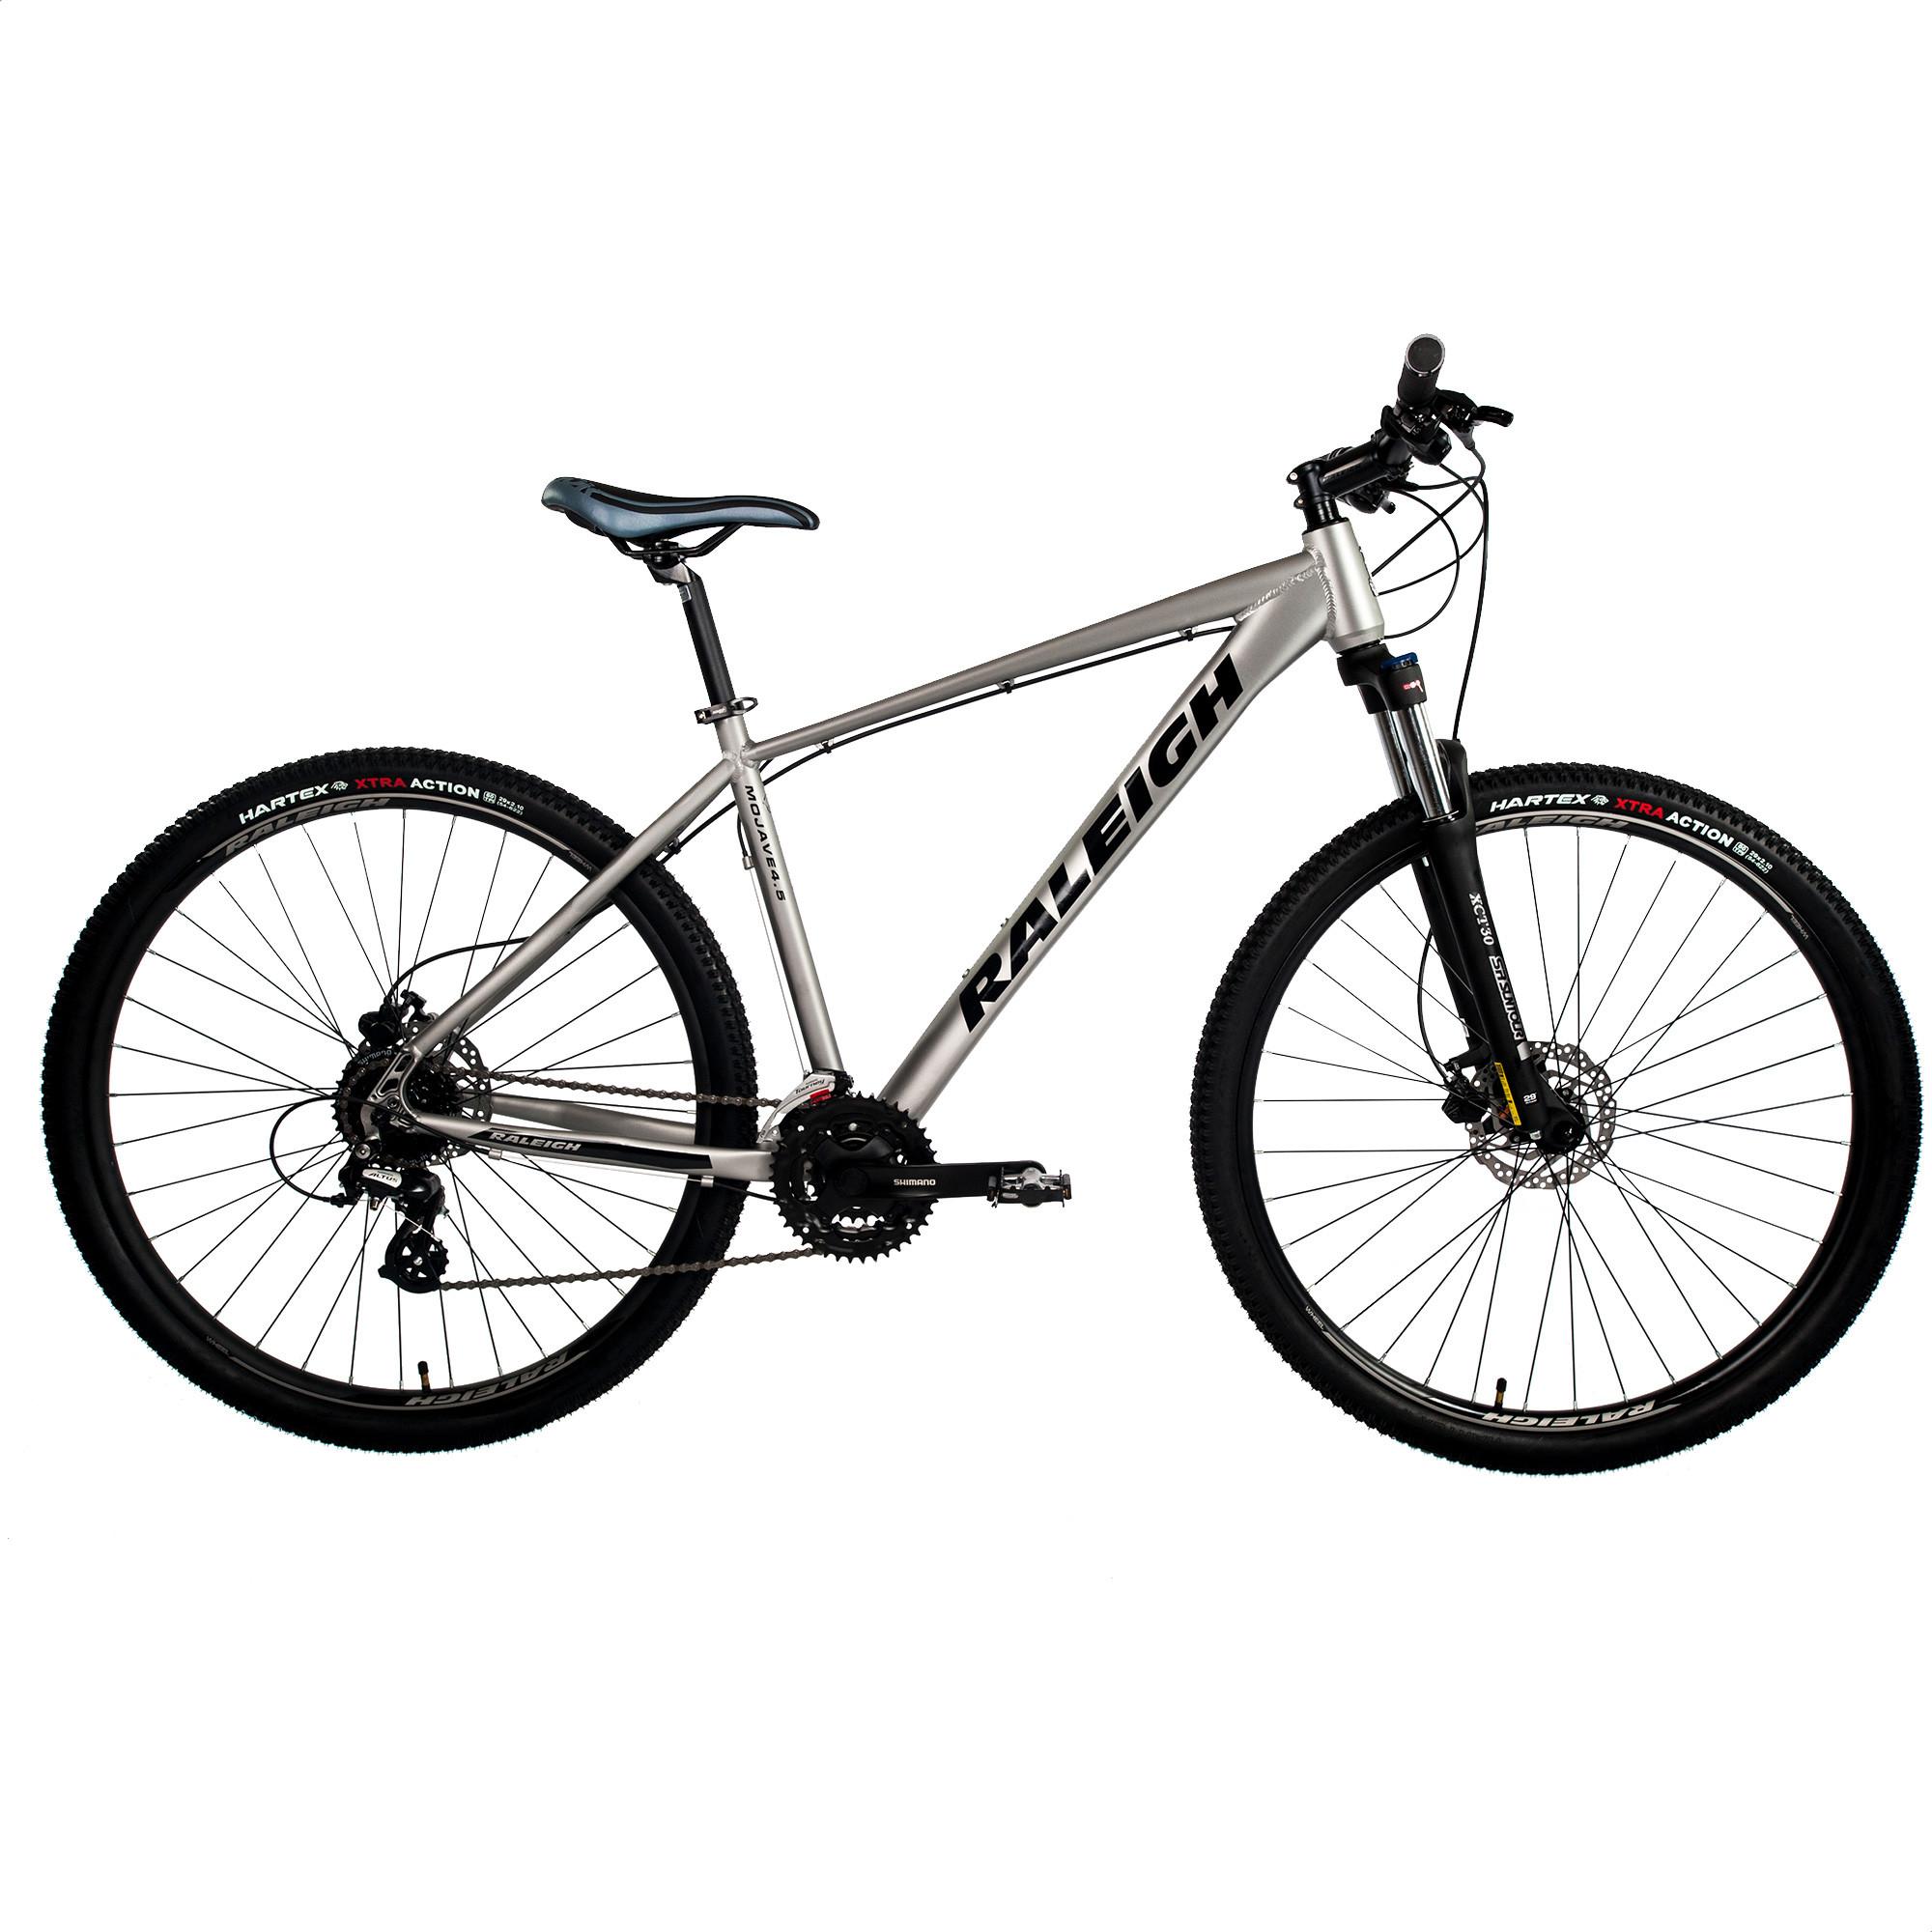 Bicicleta Mountain Bike Raleigh Mojave 4.5 R29 Aluminio Shimano